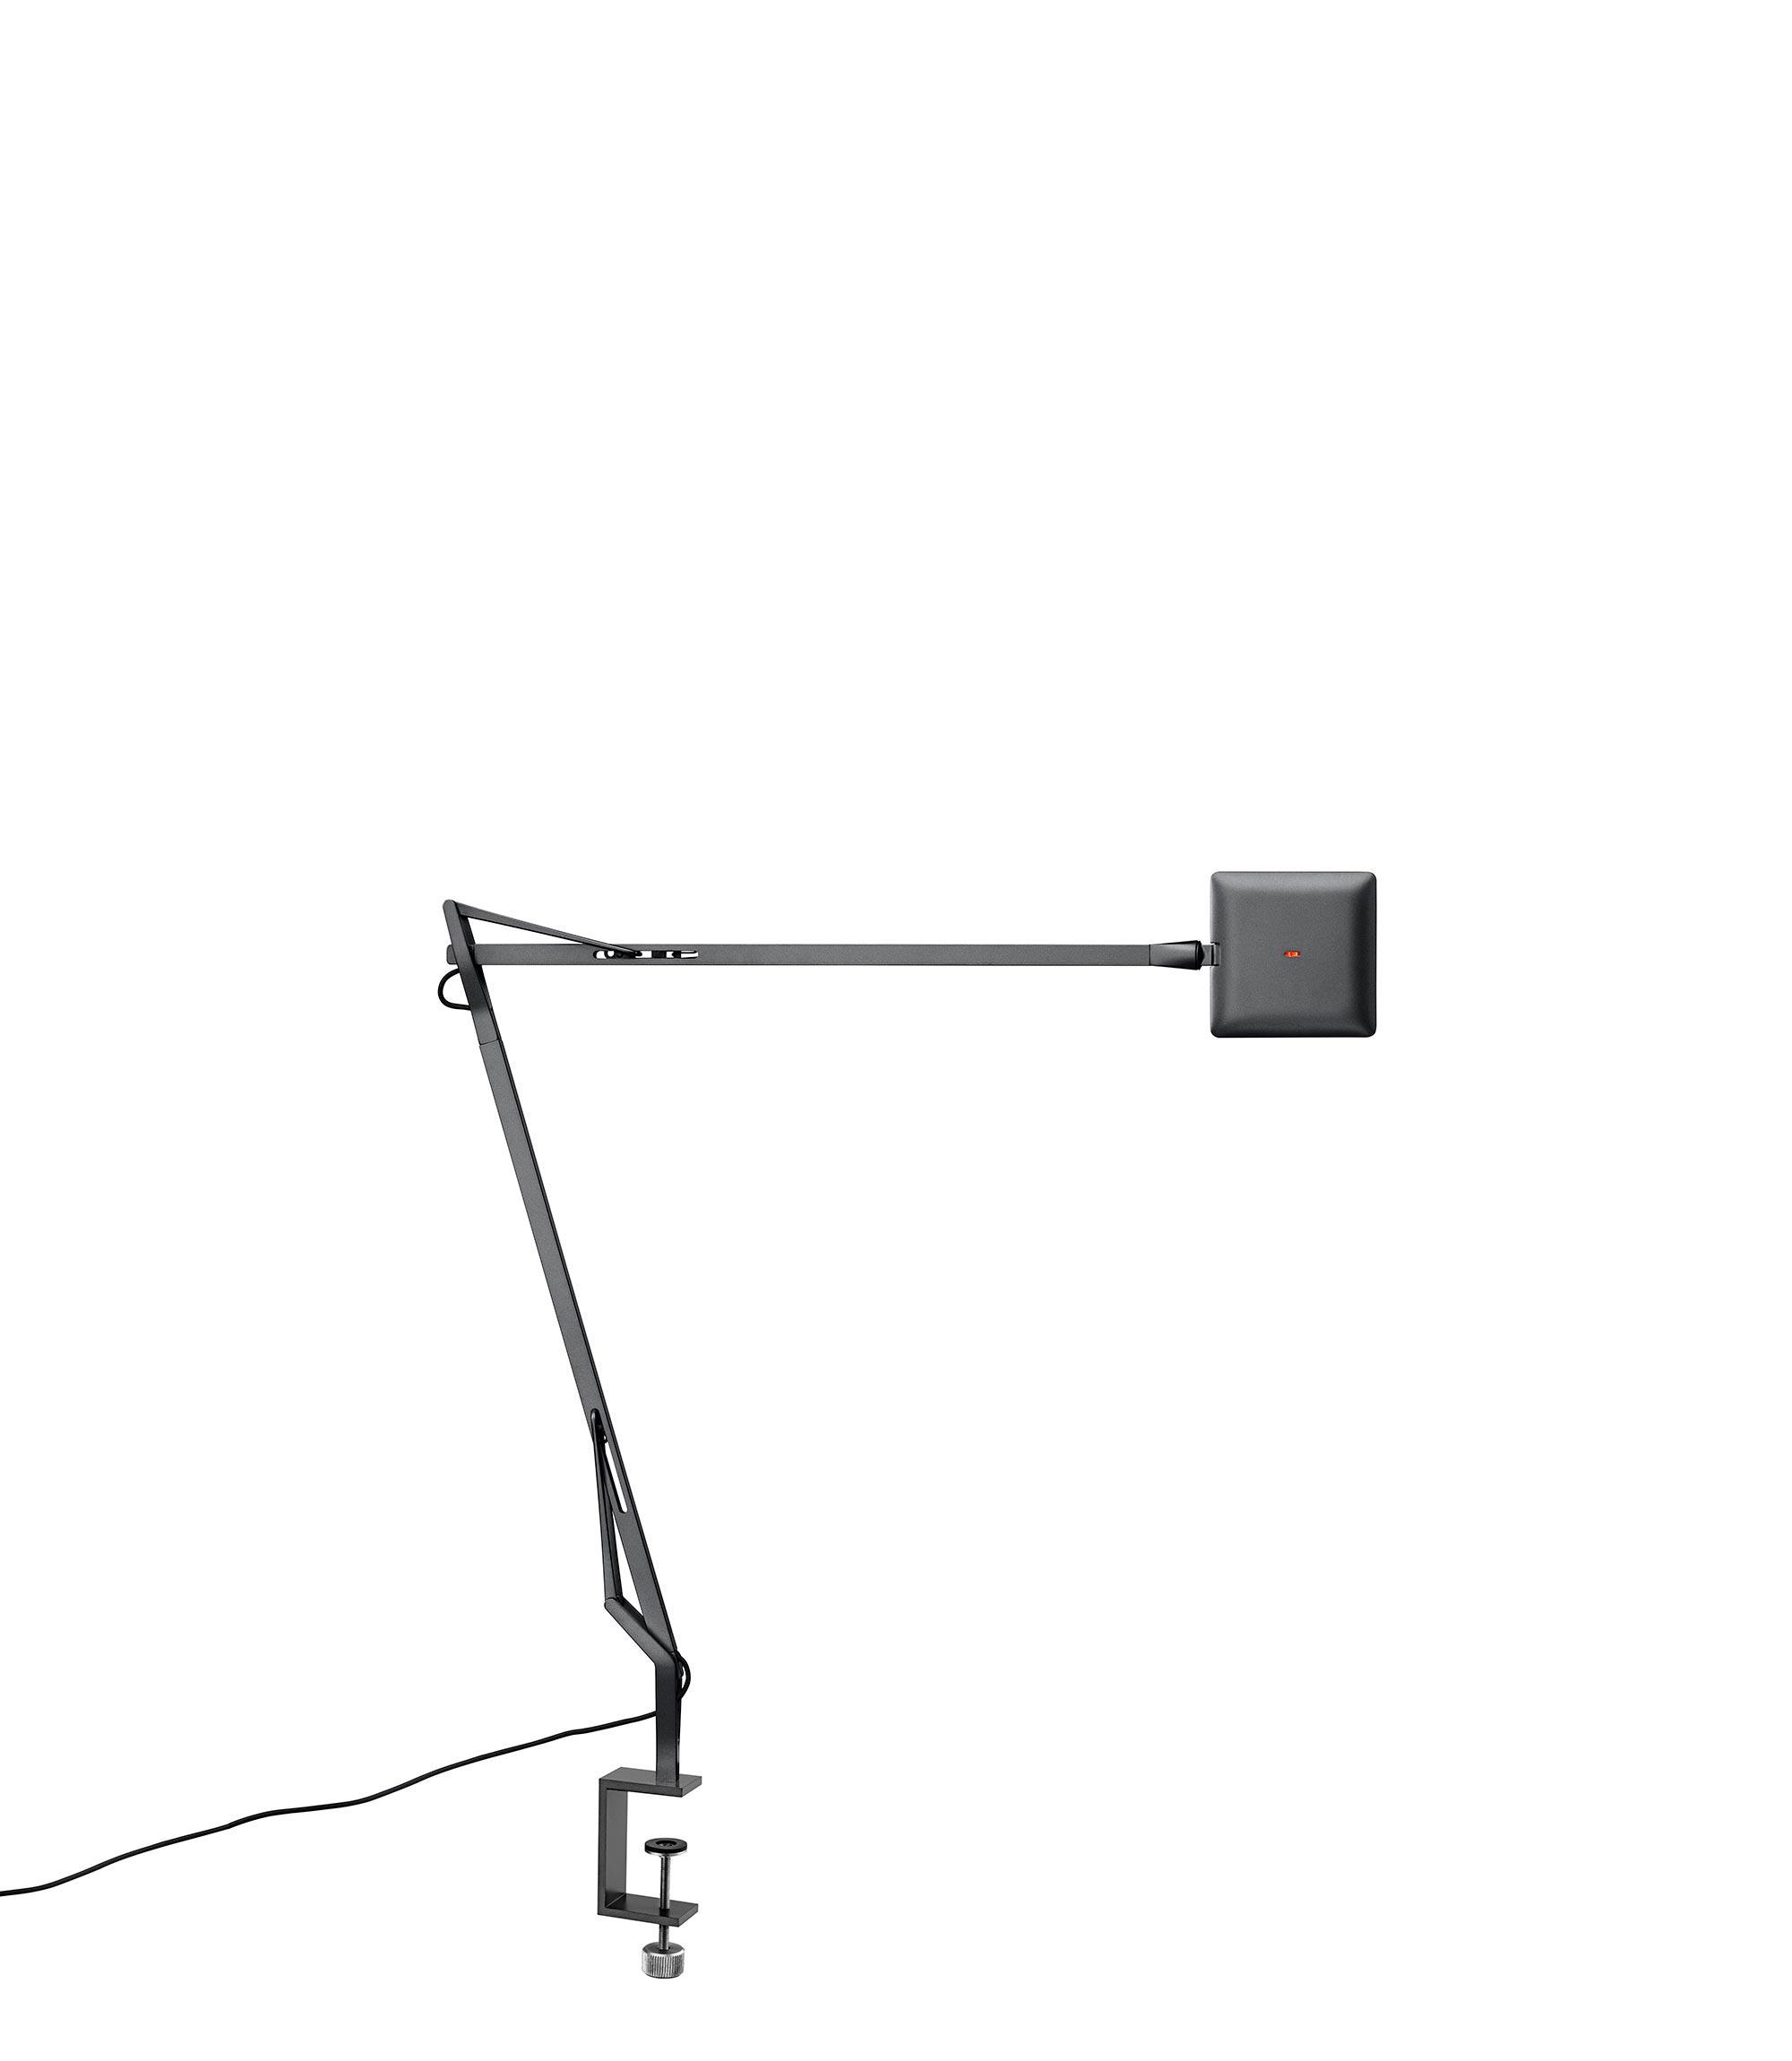 Kelvin edge table clamp citterio flos F3460033 product still life big